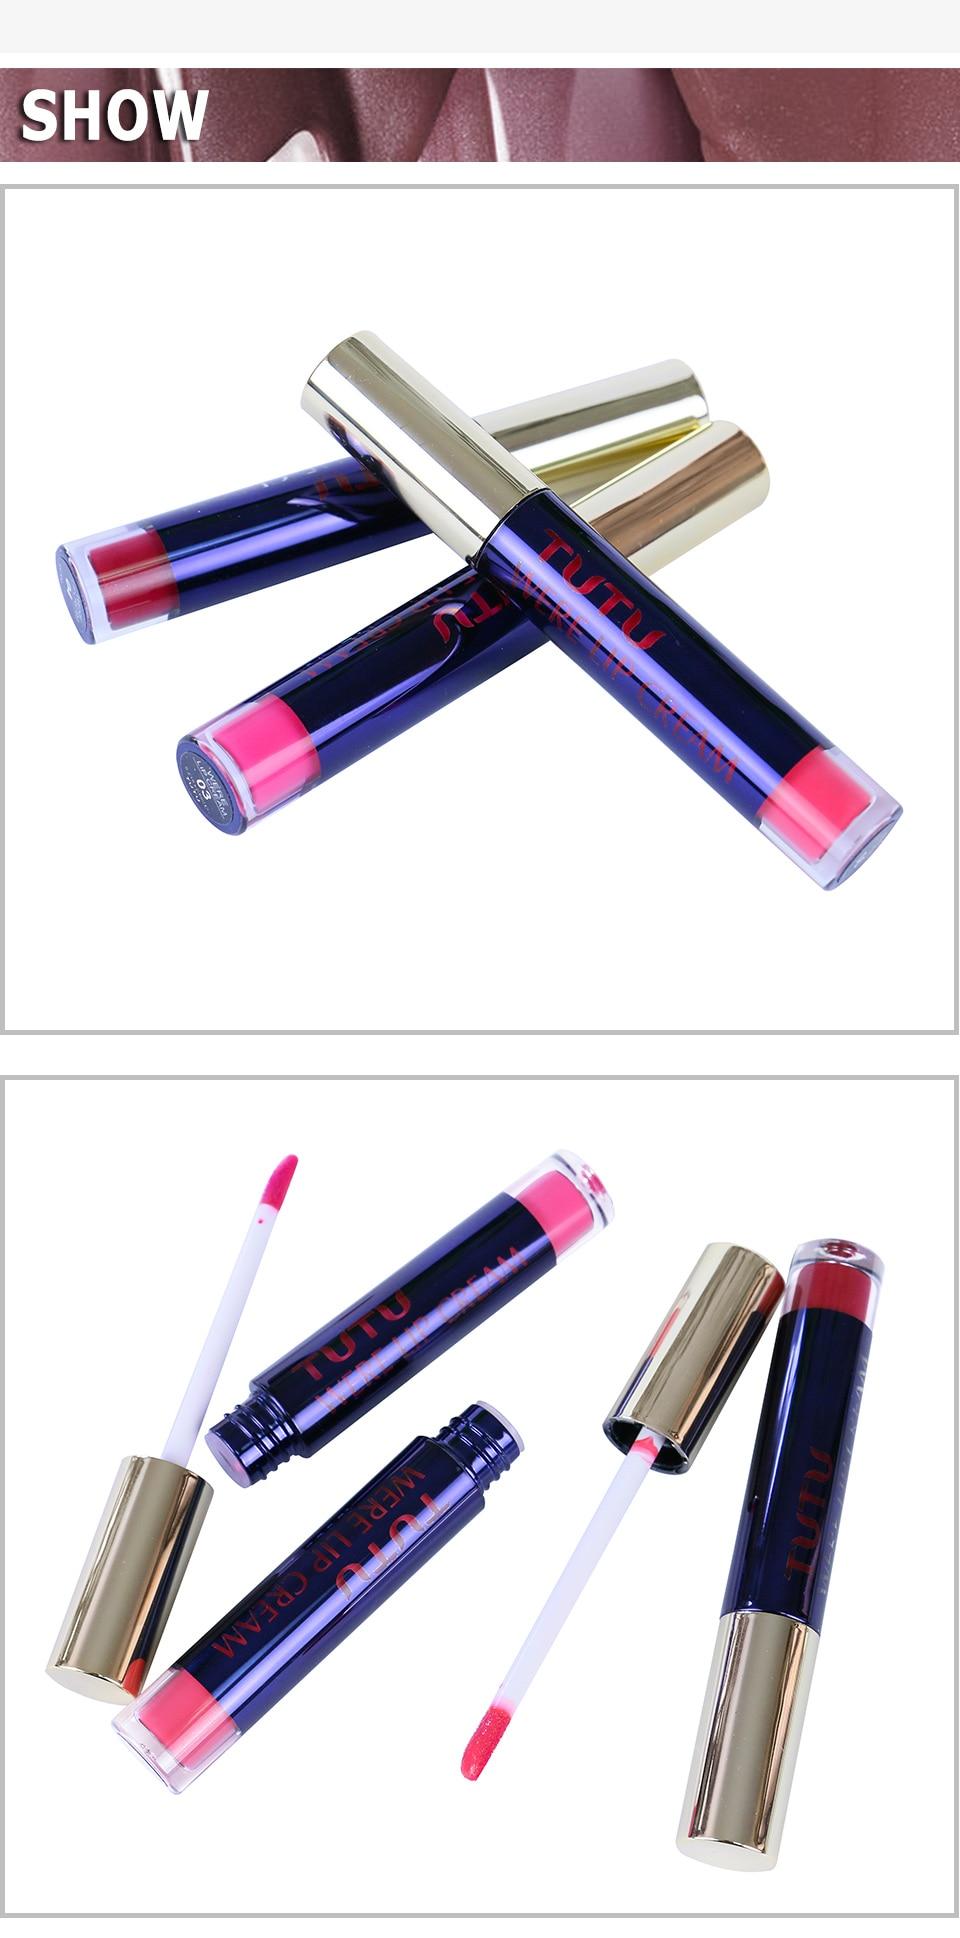 Professional Lip Makeup Matte Lip Gloss Velvet Red Lipstick Liquid Tint Waterproof Moisturizer Full Color Lip Gloss Set Make up 10